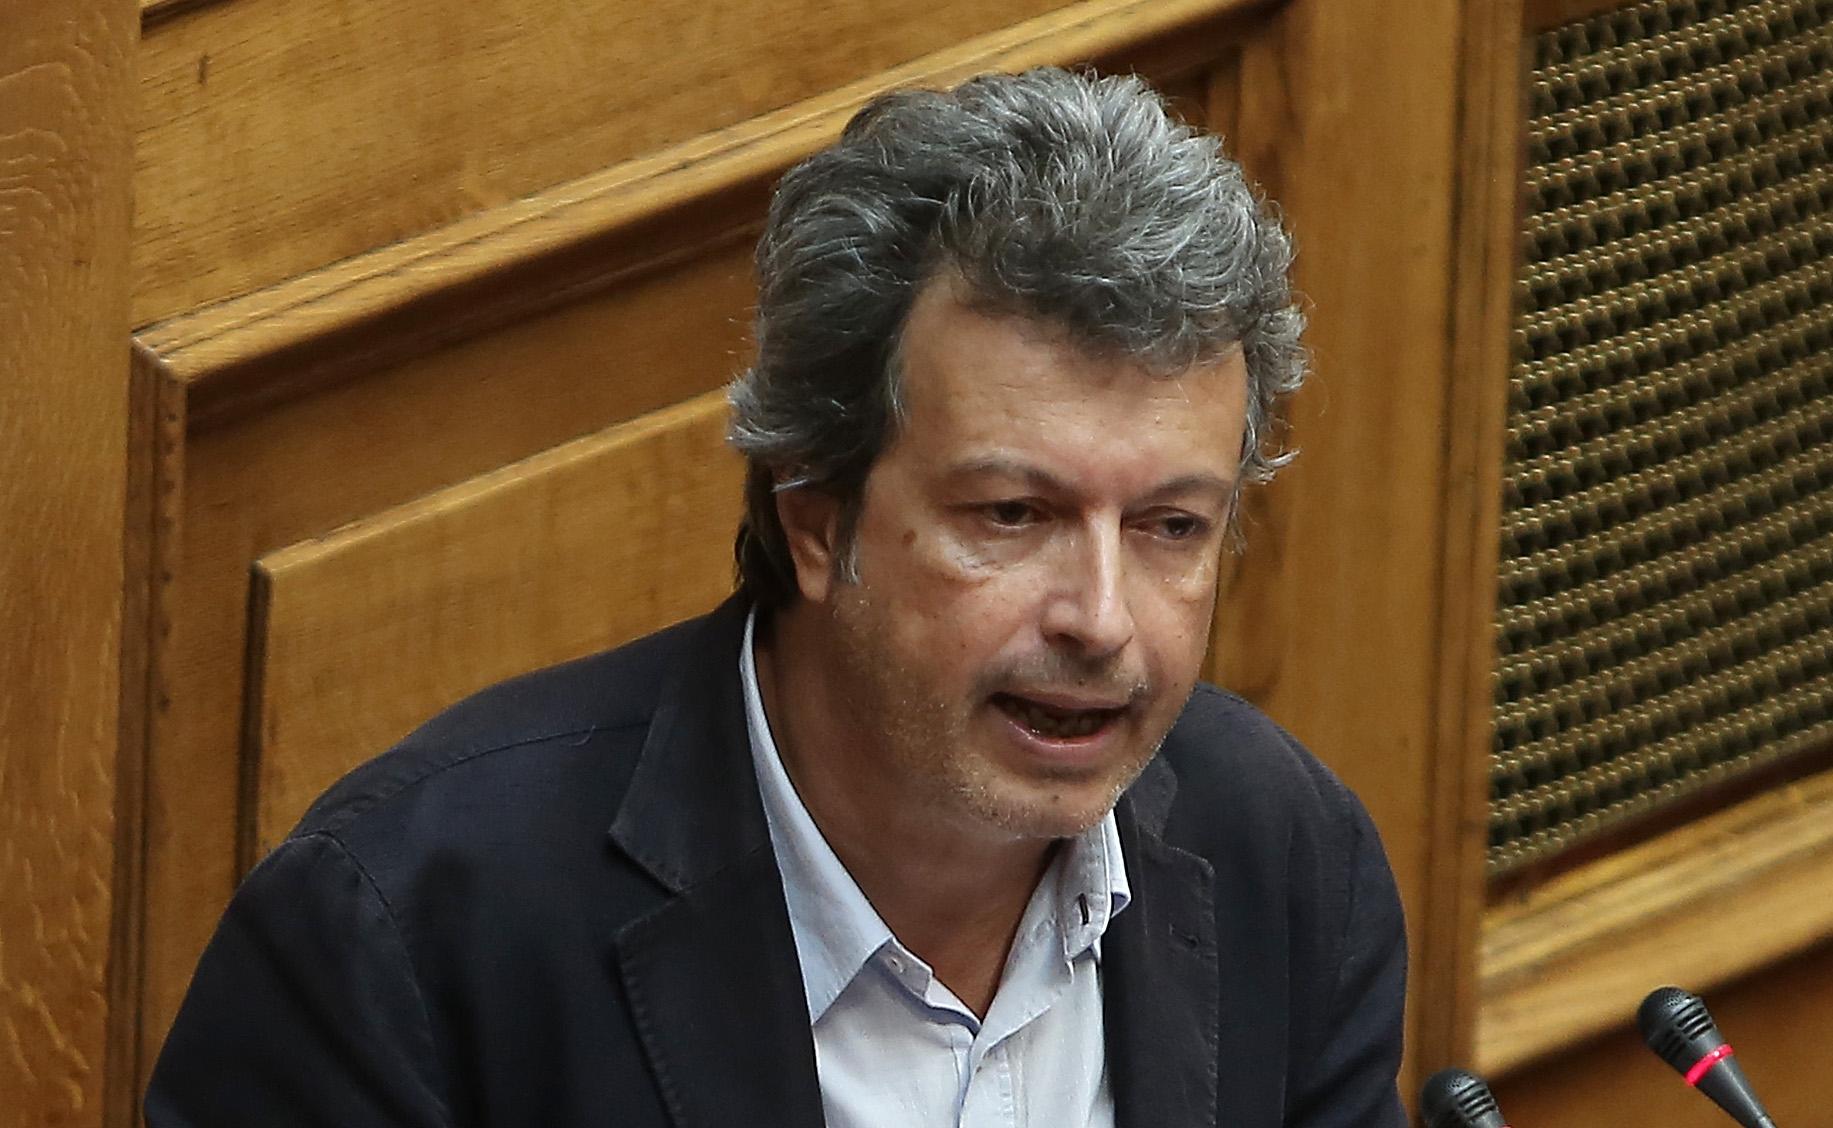 Eξιτήριο πήρε ο Πέτρος Τατσόπουλος